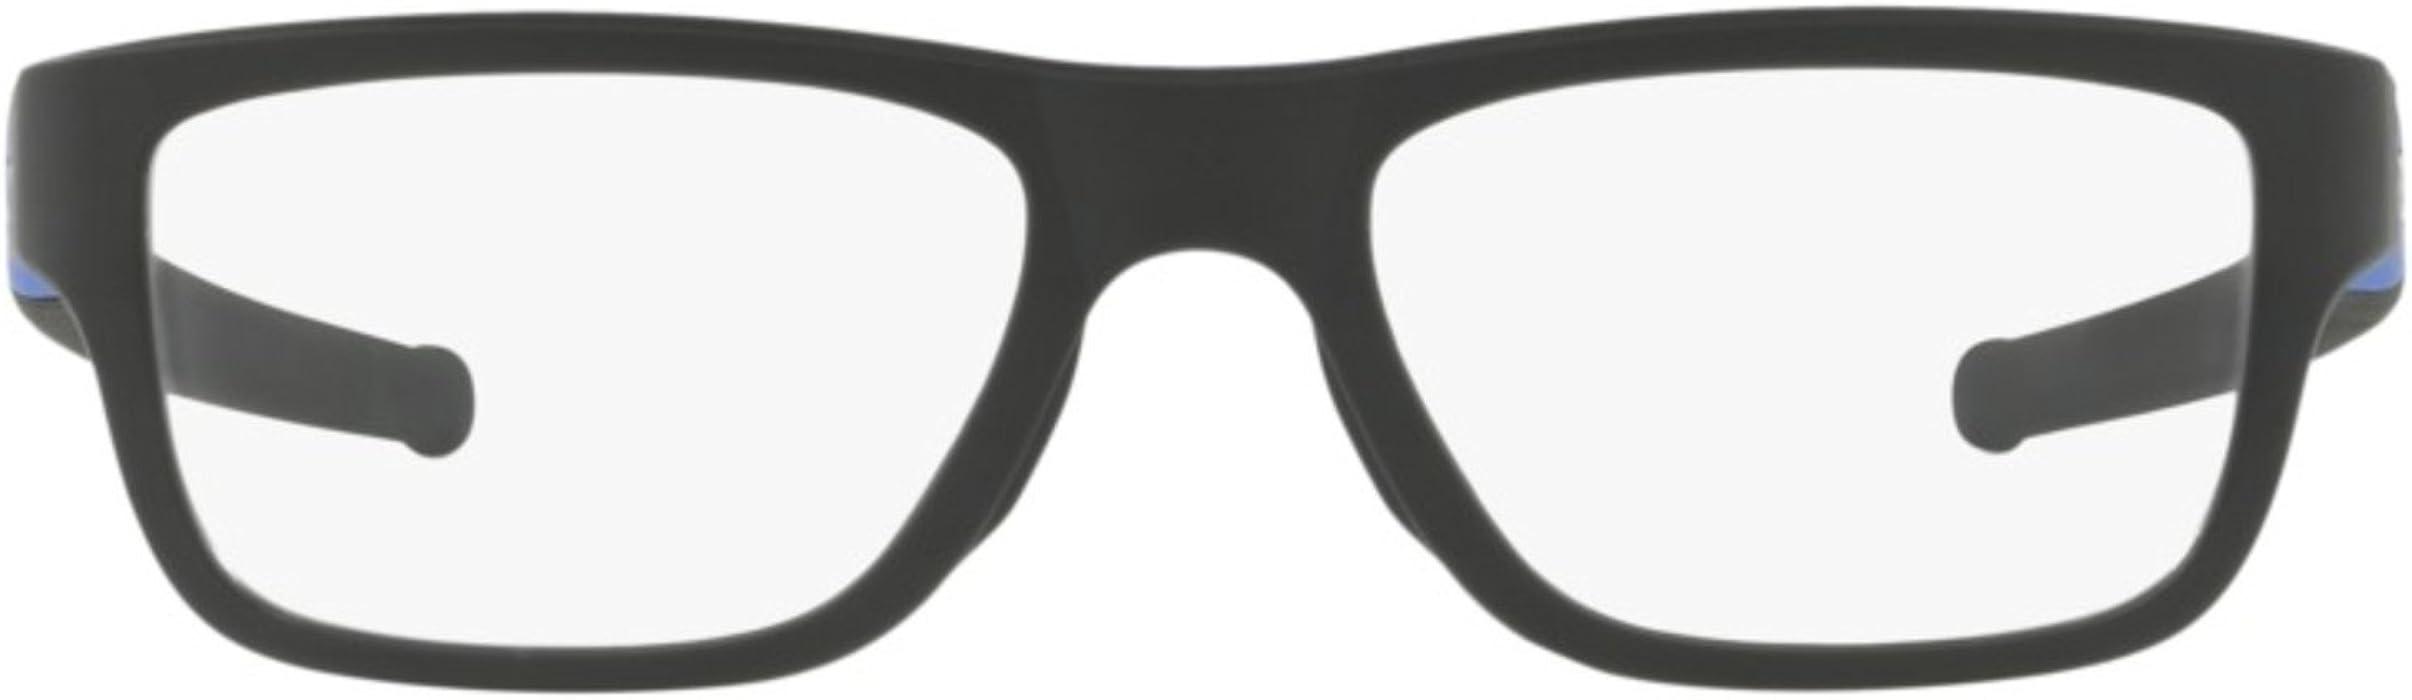 e7d58f1ab4 Amazon.com  Oakley MARSHAL COBALT COLLECTION OX8091-05 Eyeglasses ...